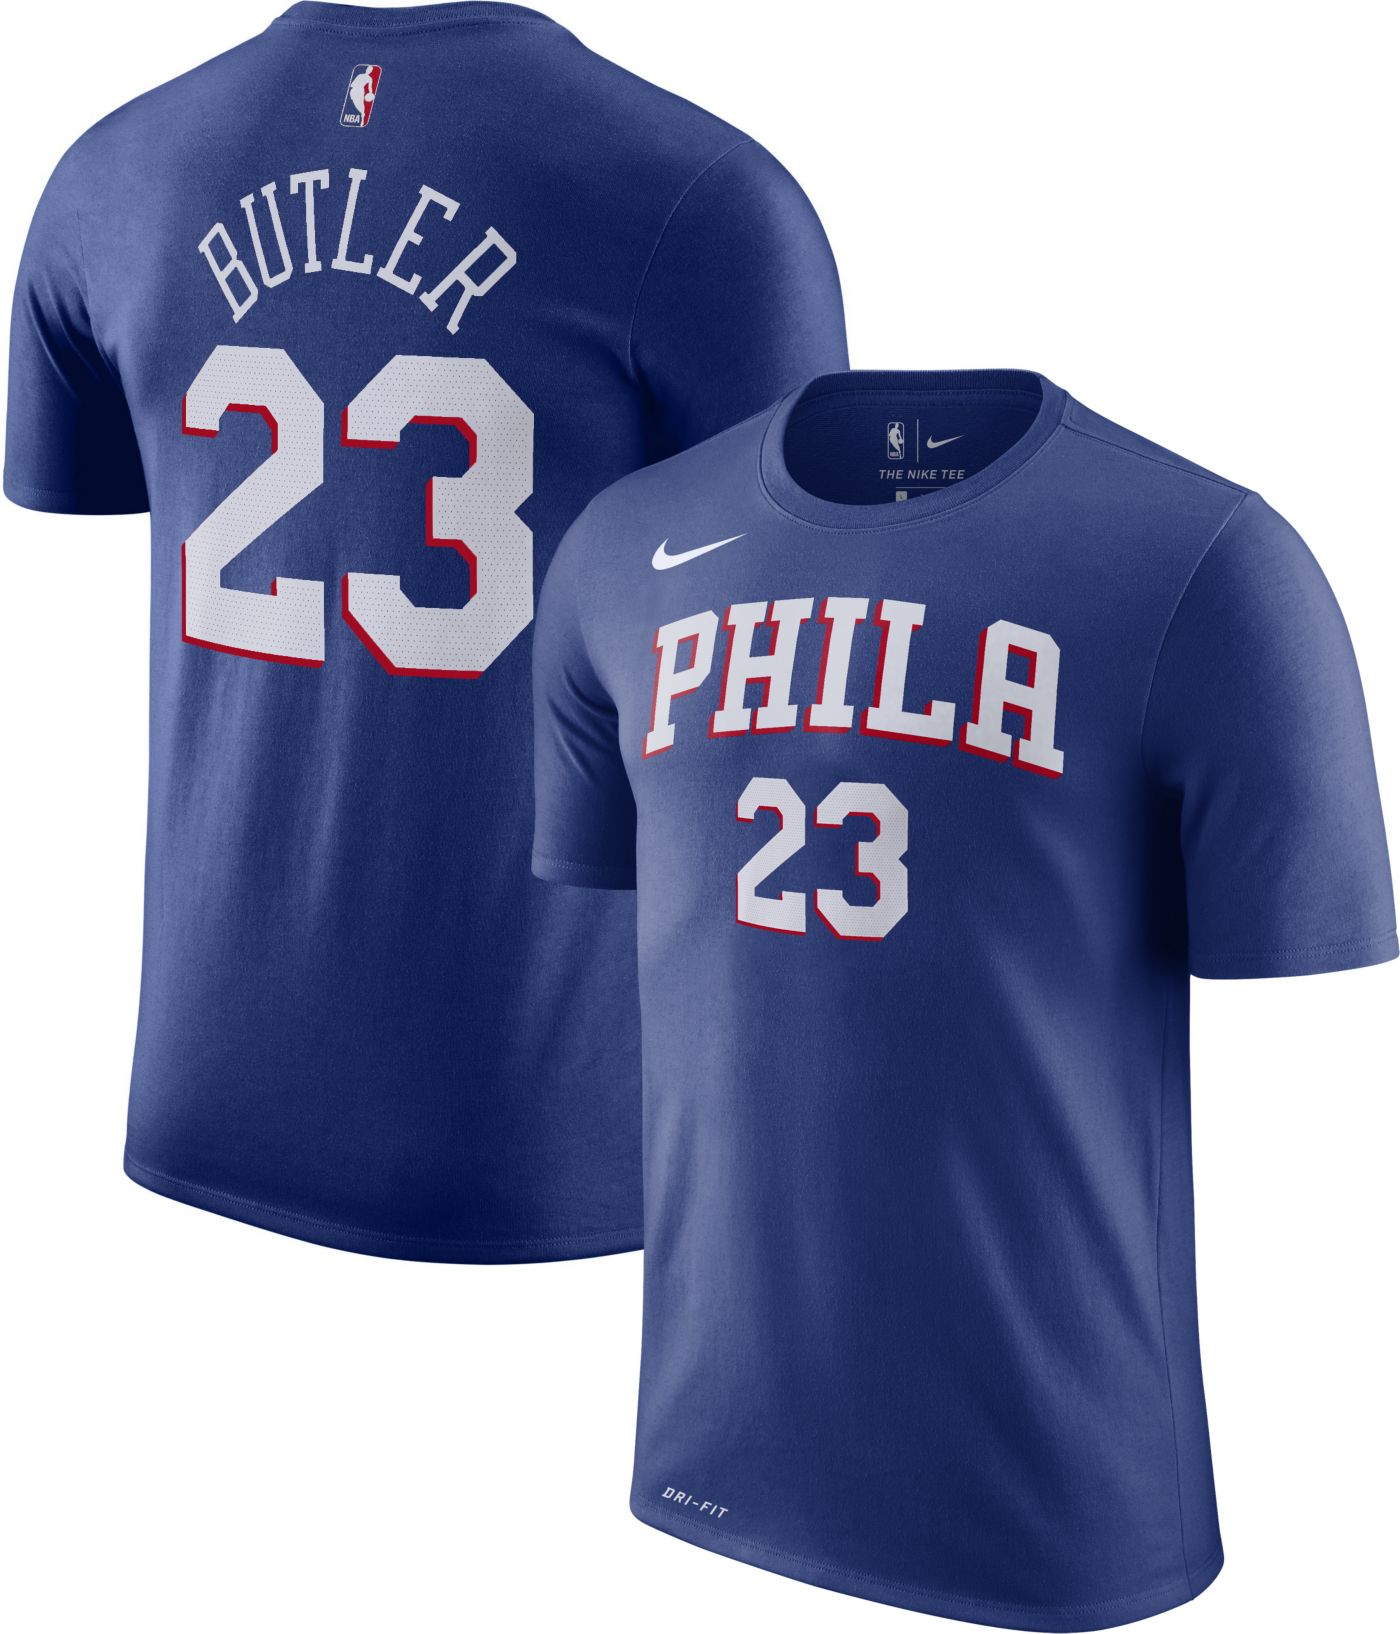 Nike Youth Philadelphia 76ers Jimmy Butler #23 Dri-FIT Royal T-Shirt